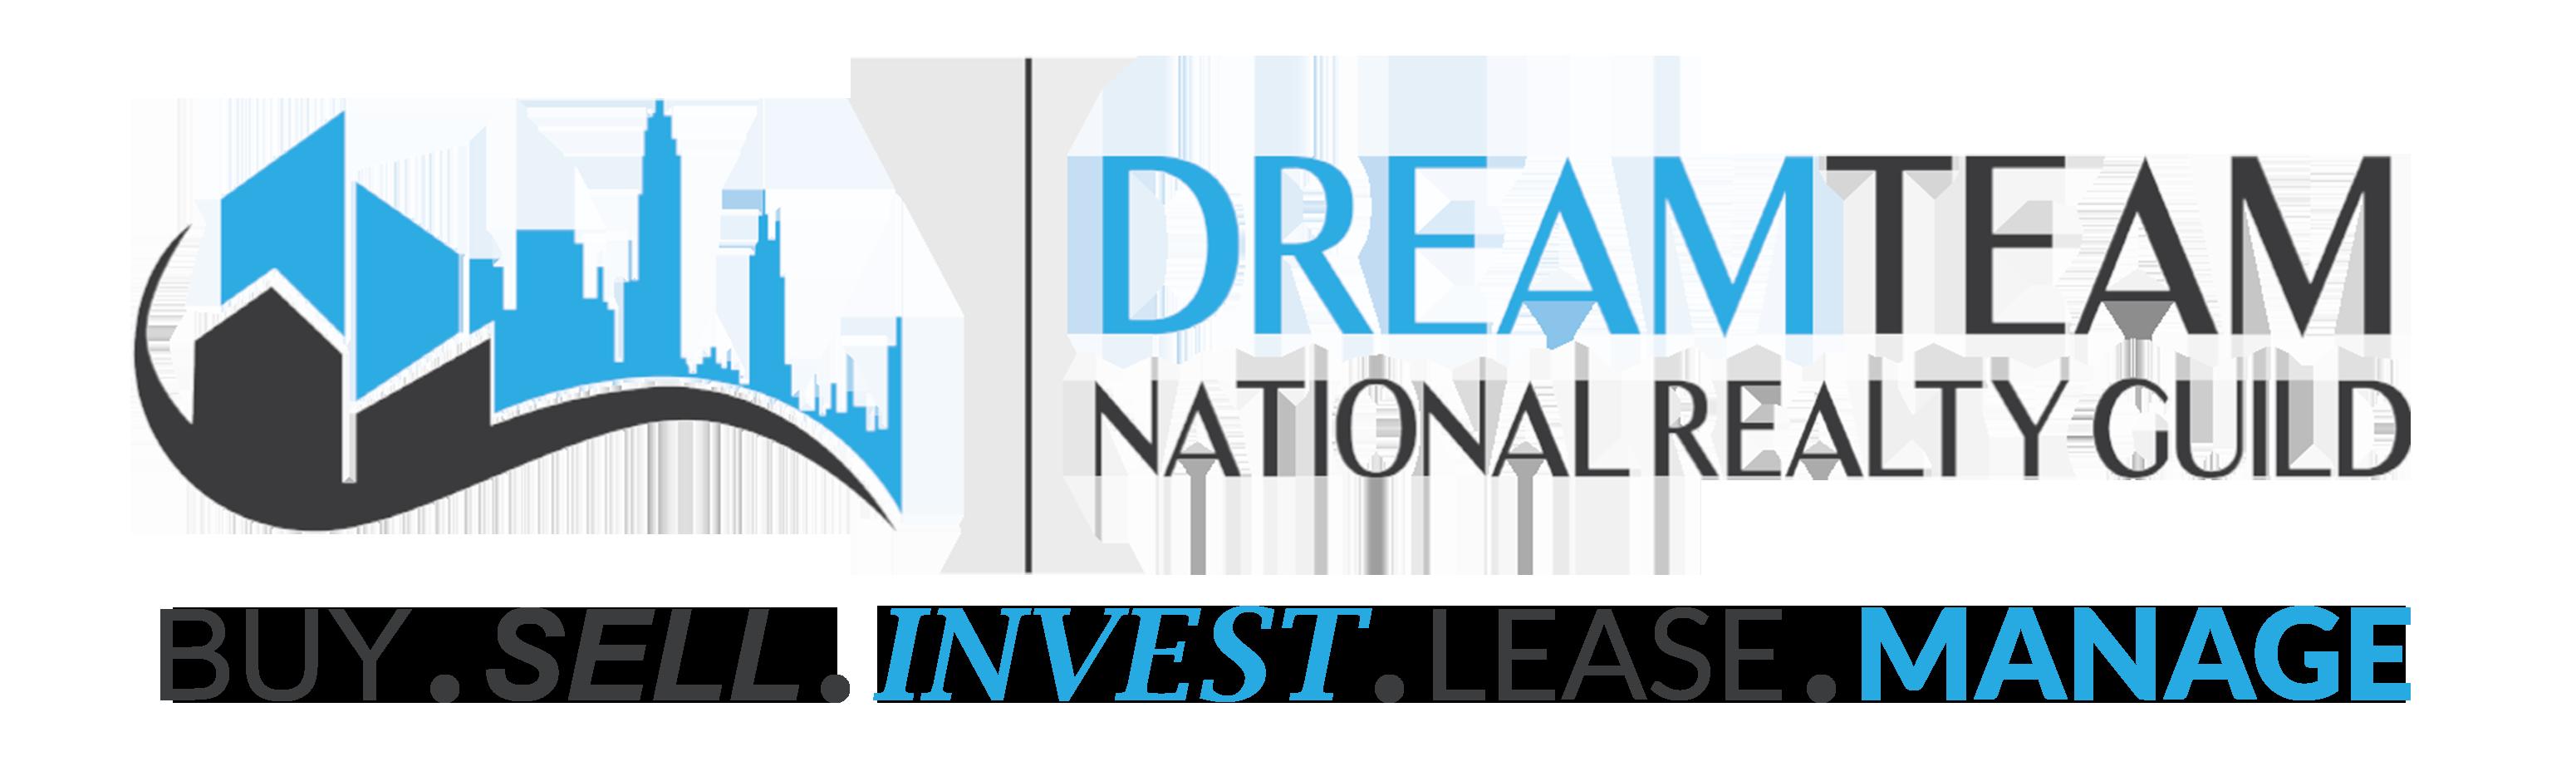 Dreamteam of national realty guild logo